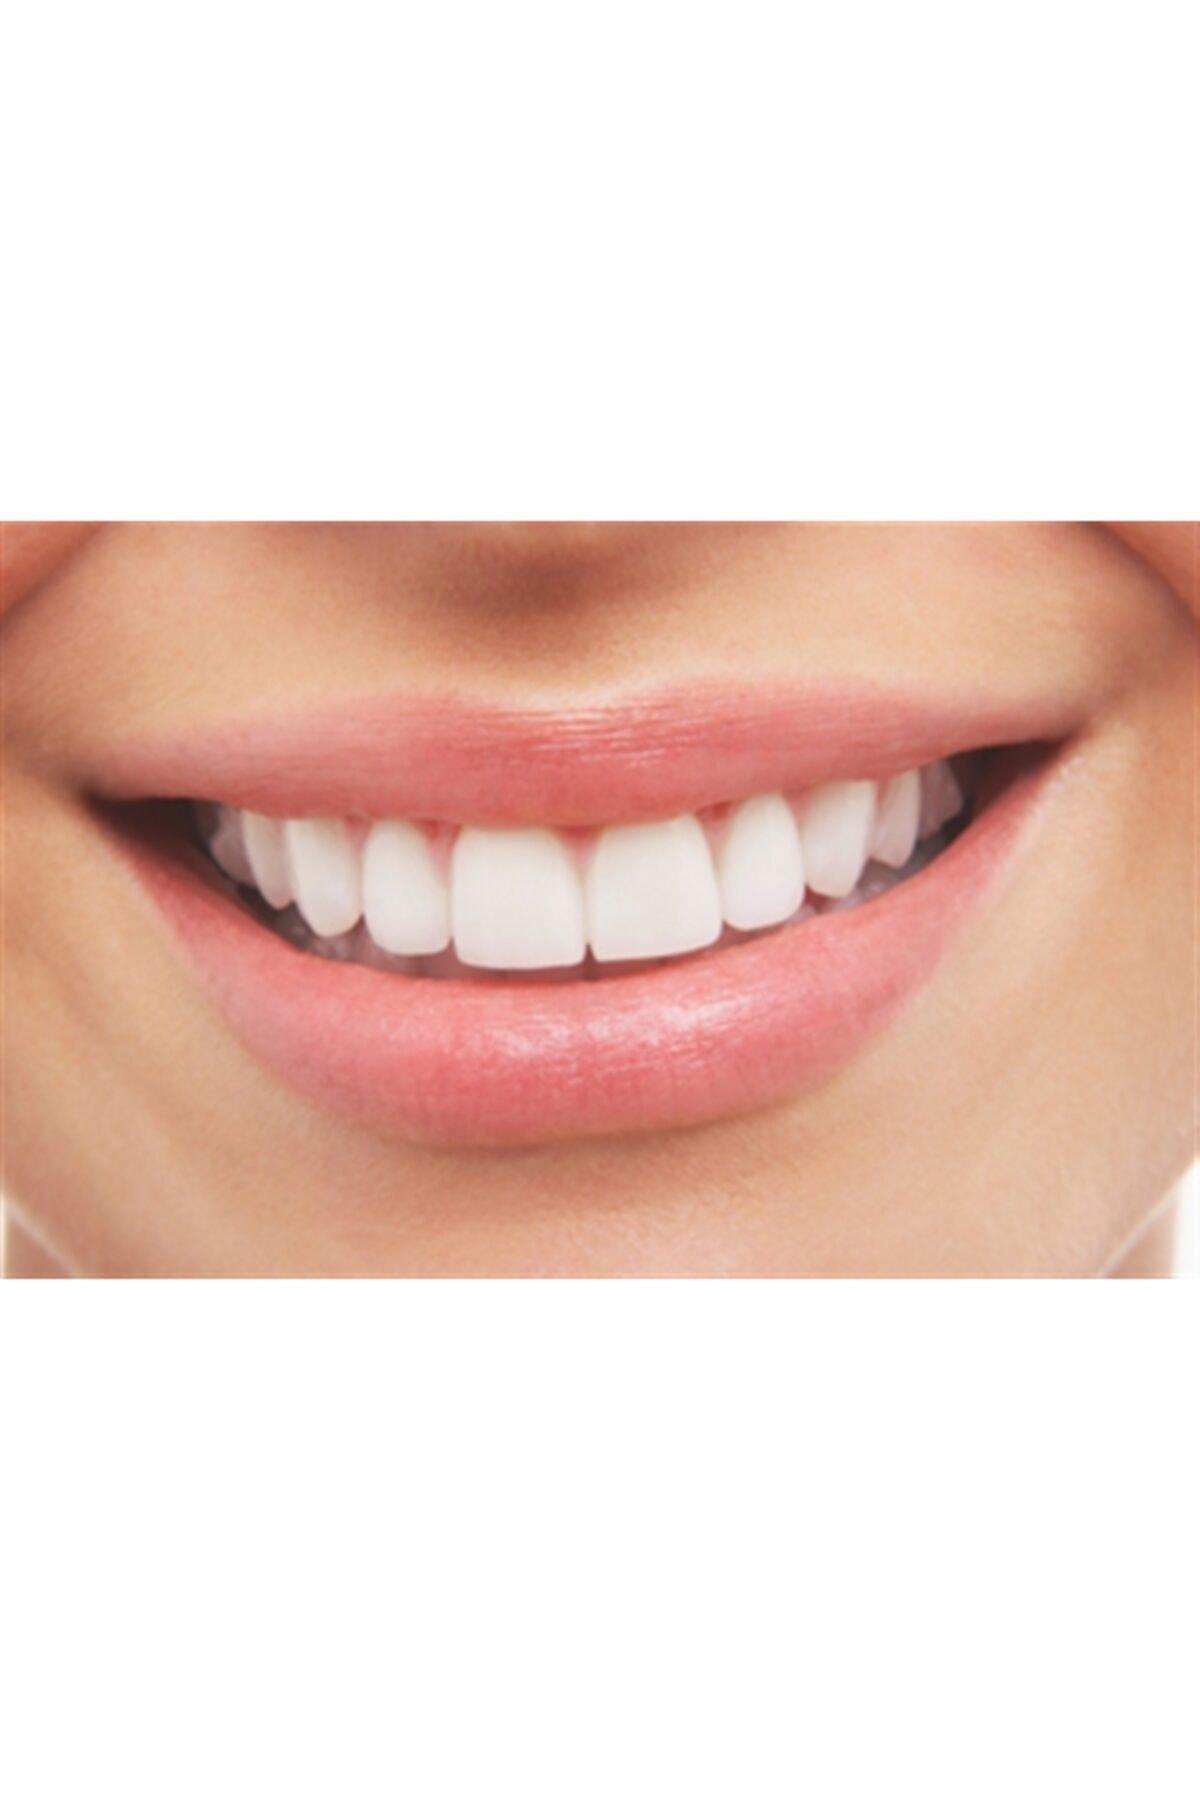 SIMPLE CARE Natural Teeth Whıtenıng - Simple Care 2 2